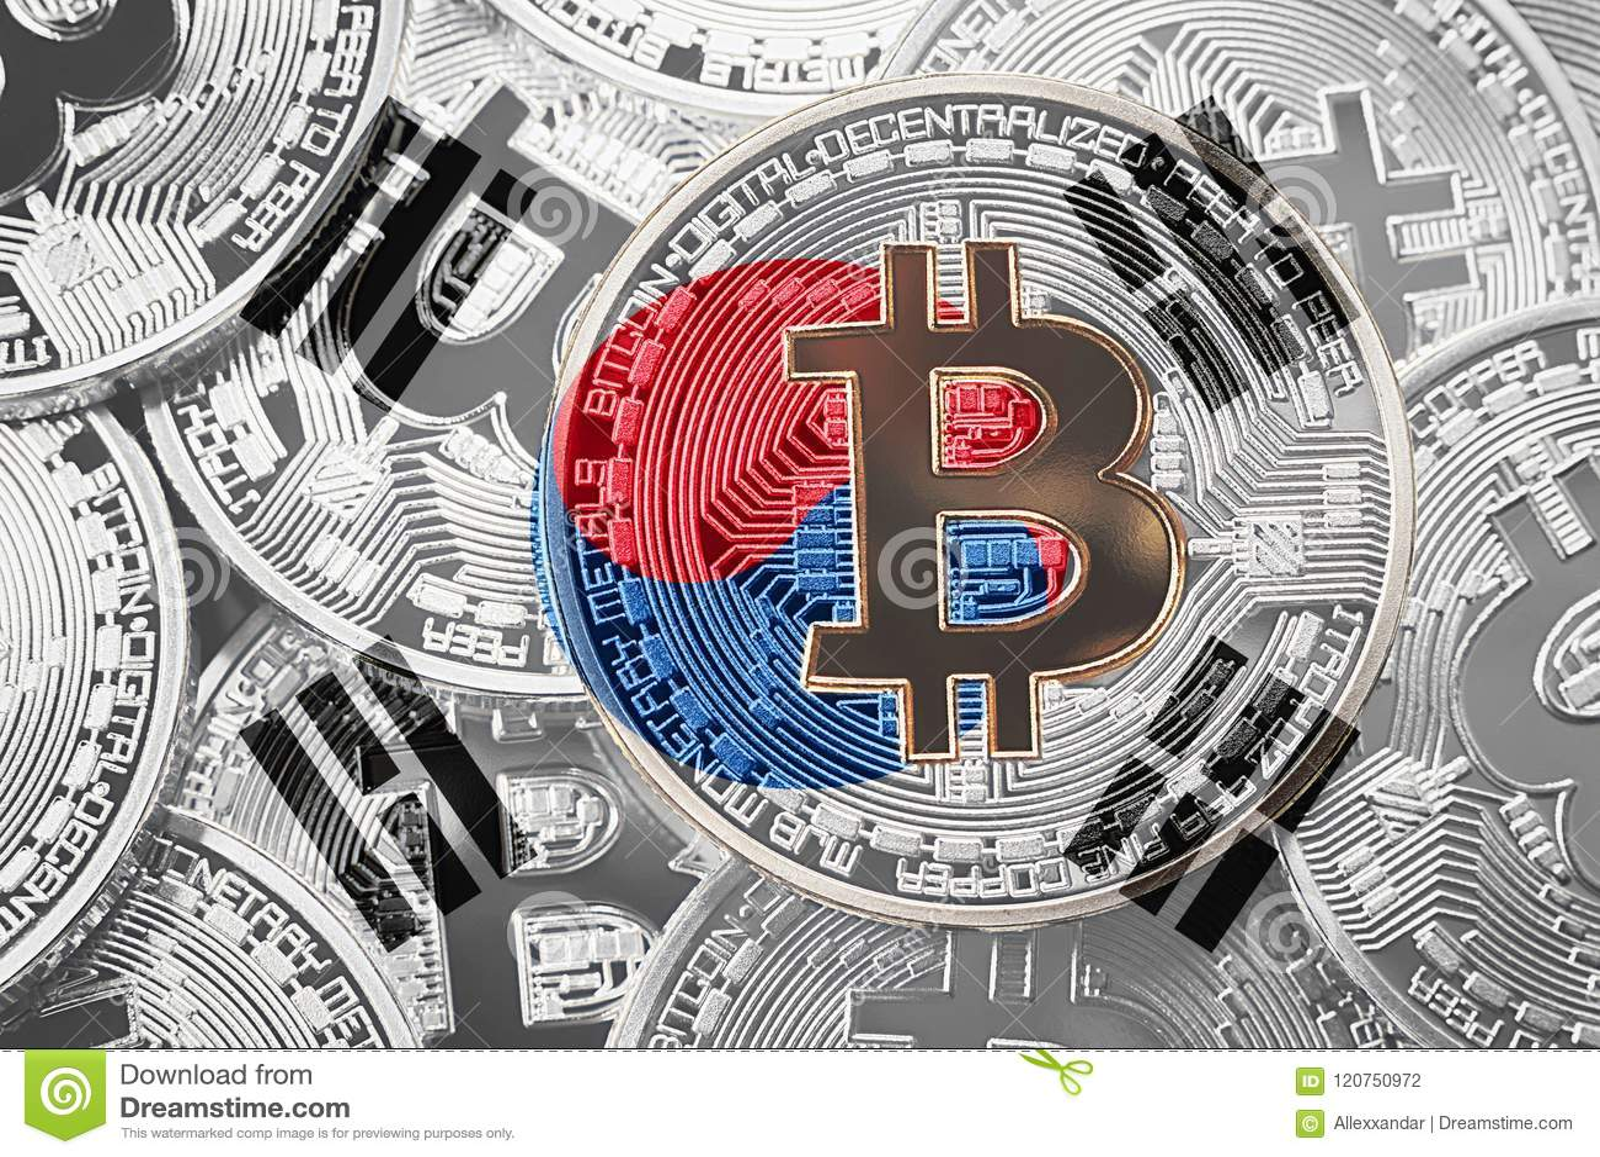 Stack of Bitcoin South Korea flag. Bitcoin cryptocurrencies concept. BTC background.